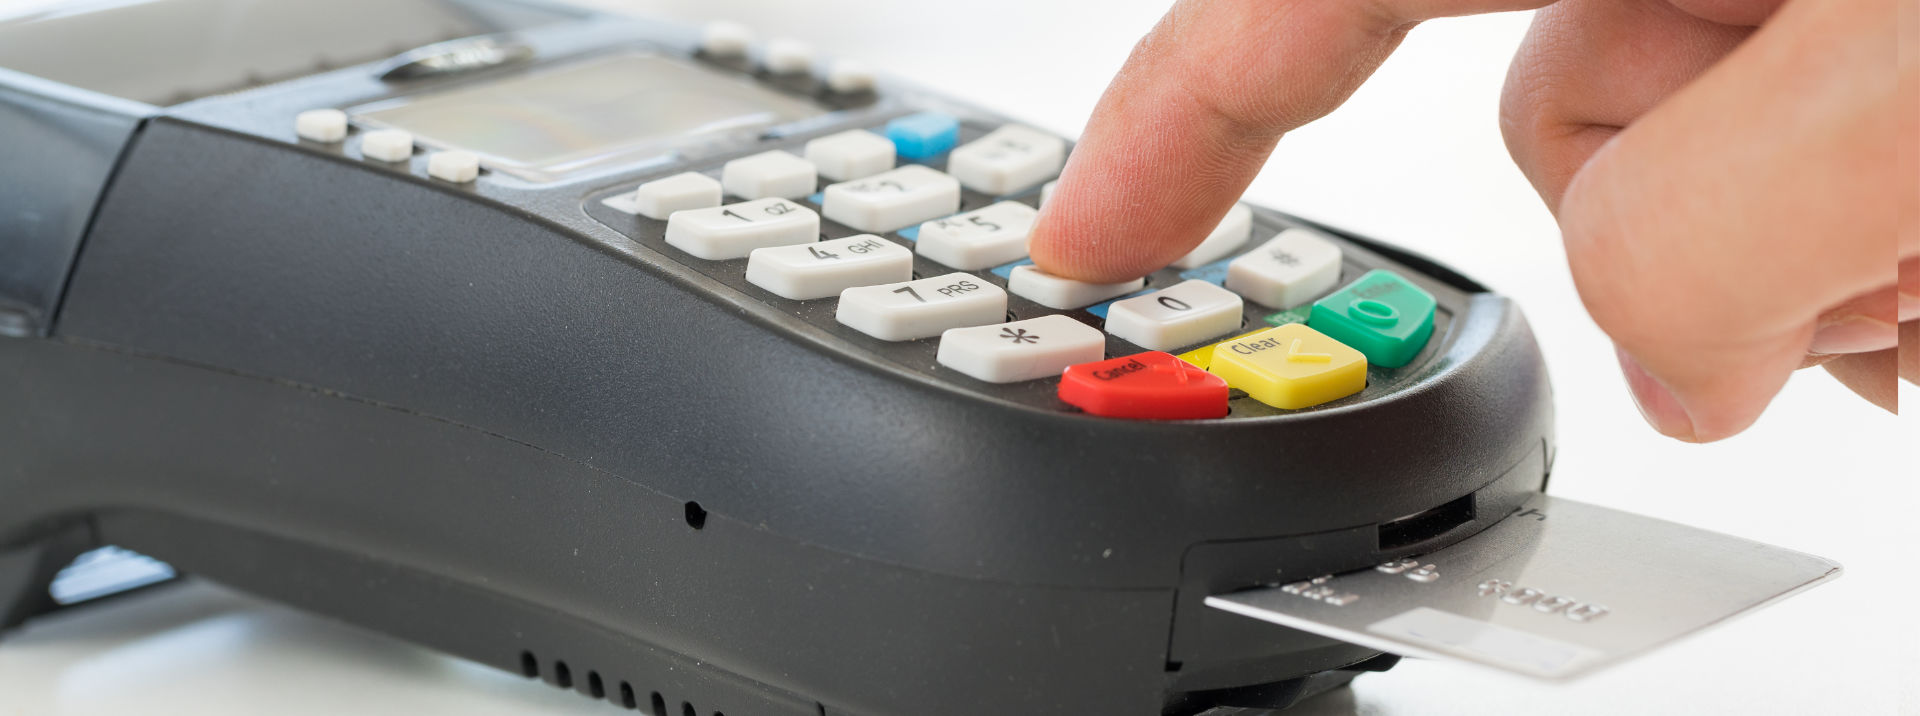 Ozark bank visa business debit card visa business debit card colourmoves